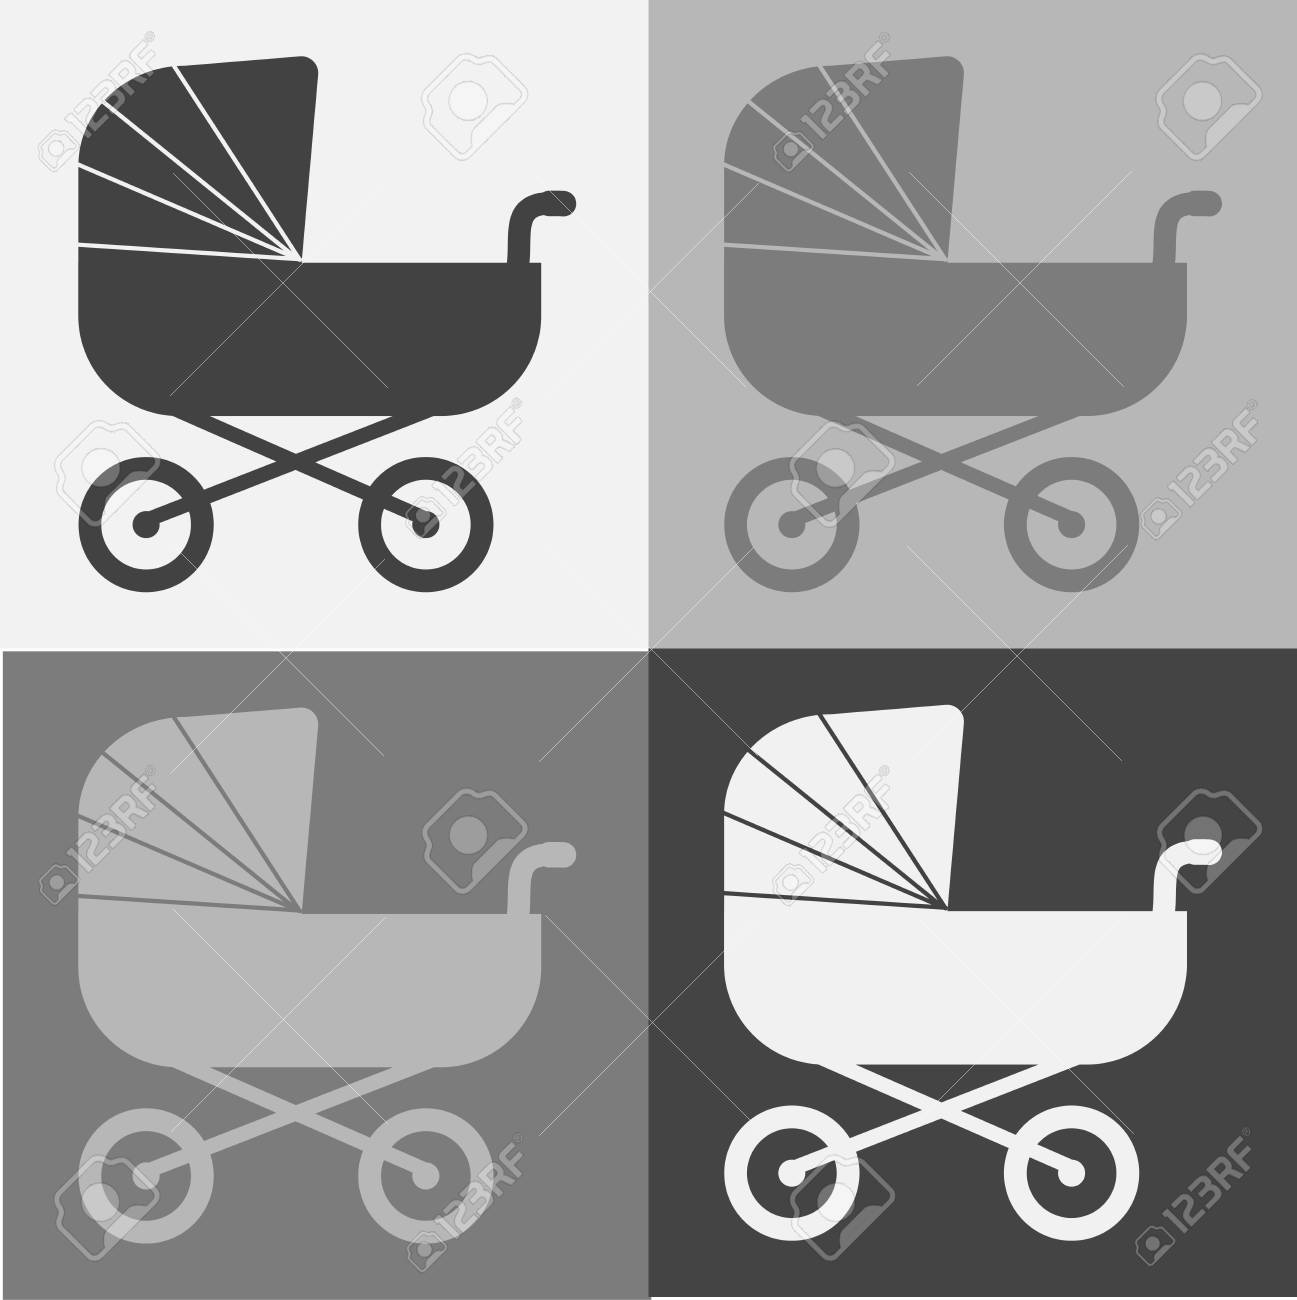 Moderno, cochecito del bebé, icono, simple, estilo Clipart